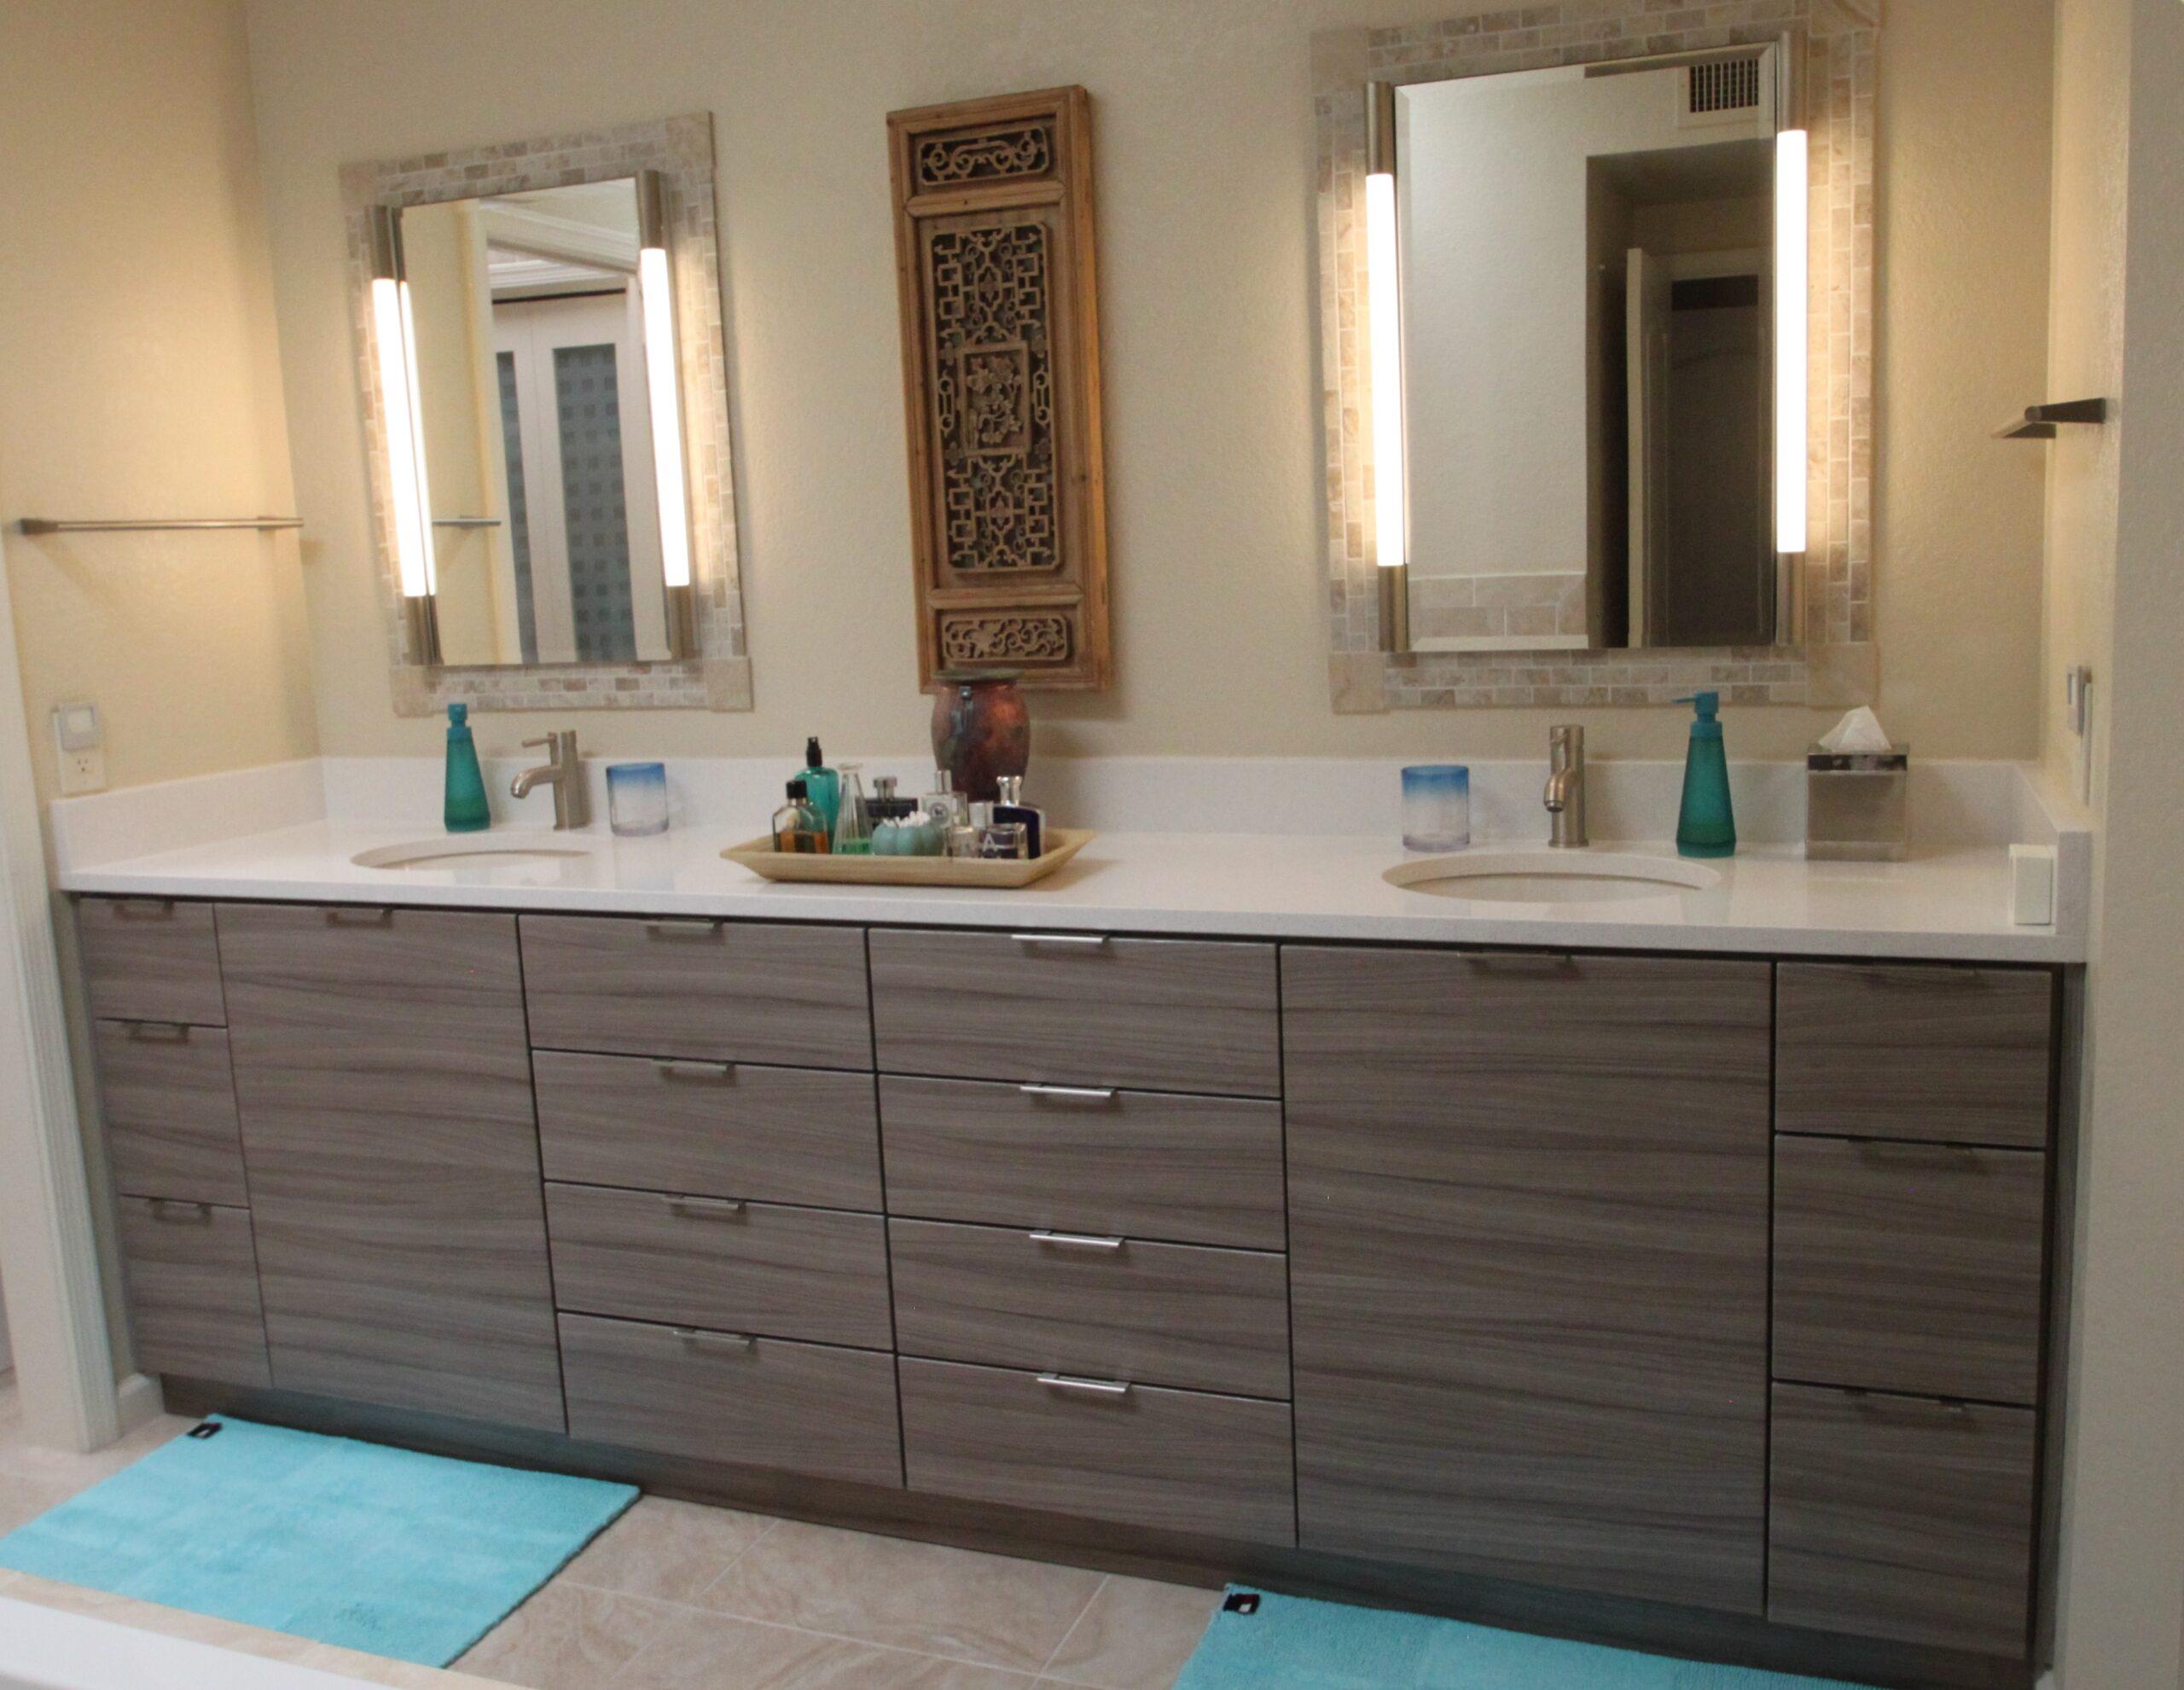 bathroom cabinets tucson az - Bathroom Cabinets Tucson Az